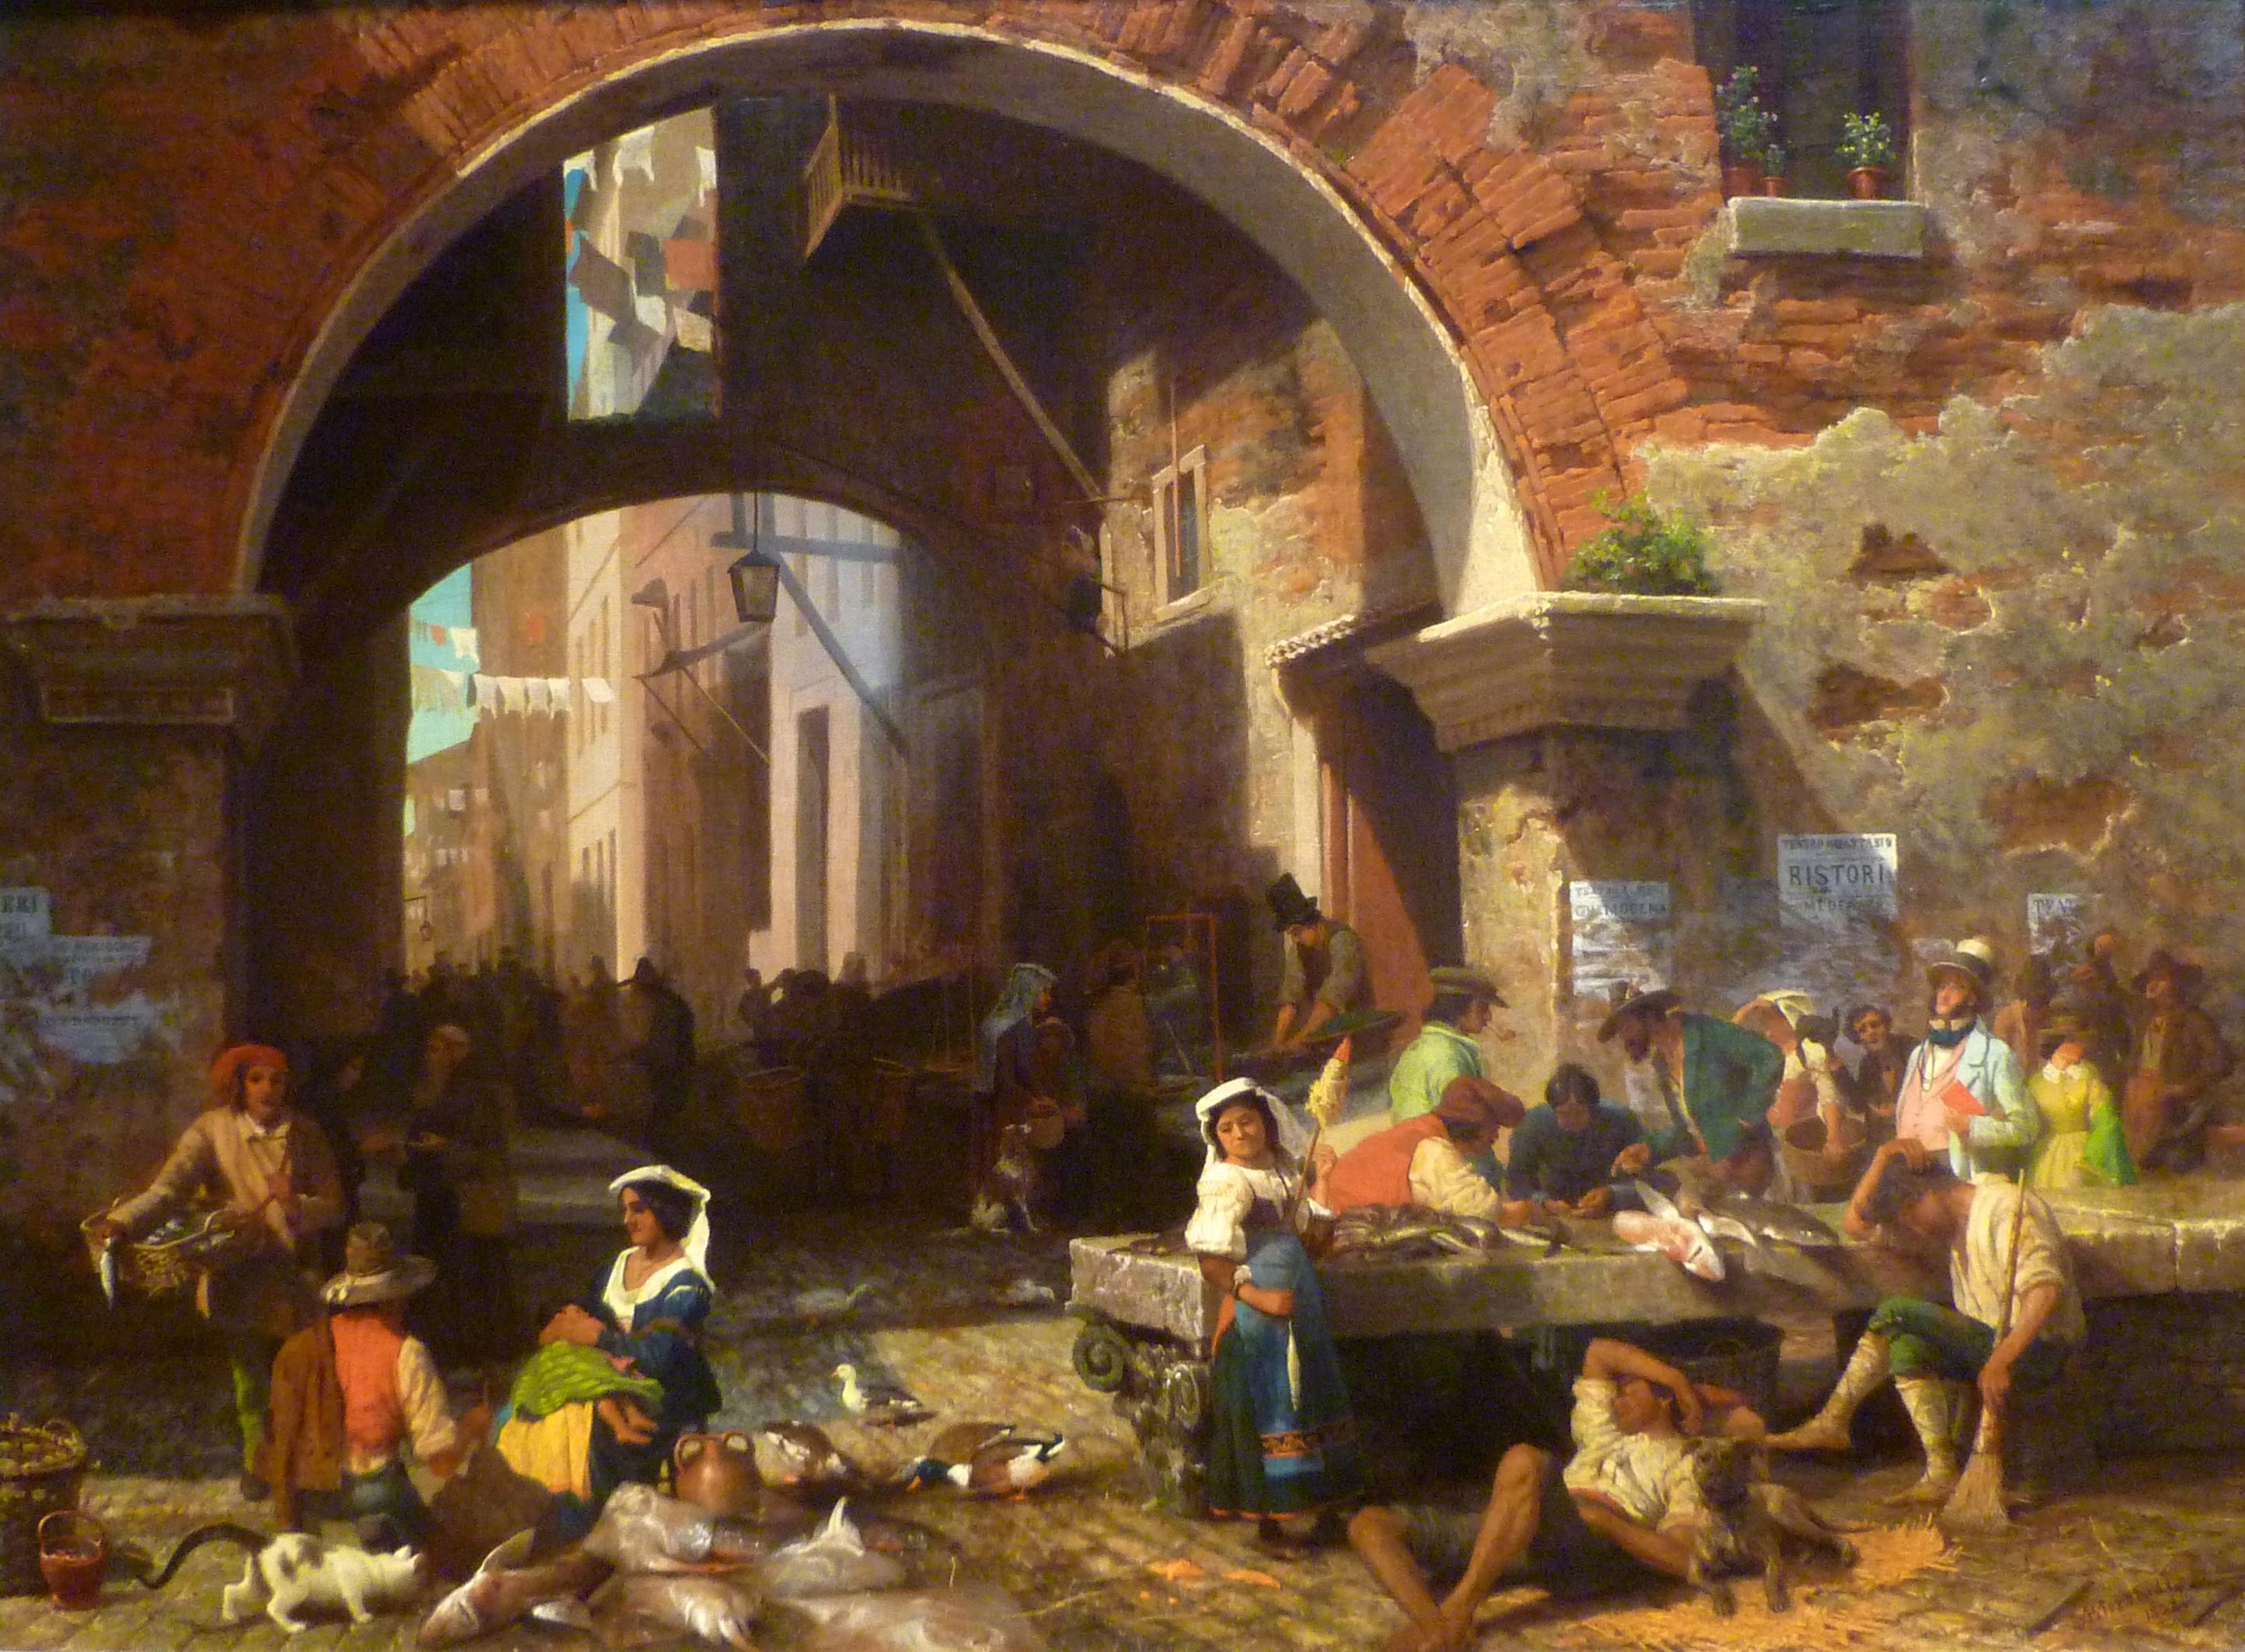 Albert bierstadt a pigment of your imagination for Empire fish market